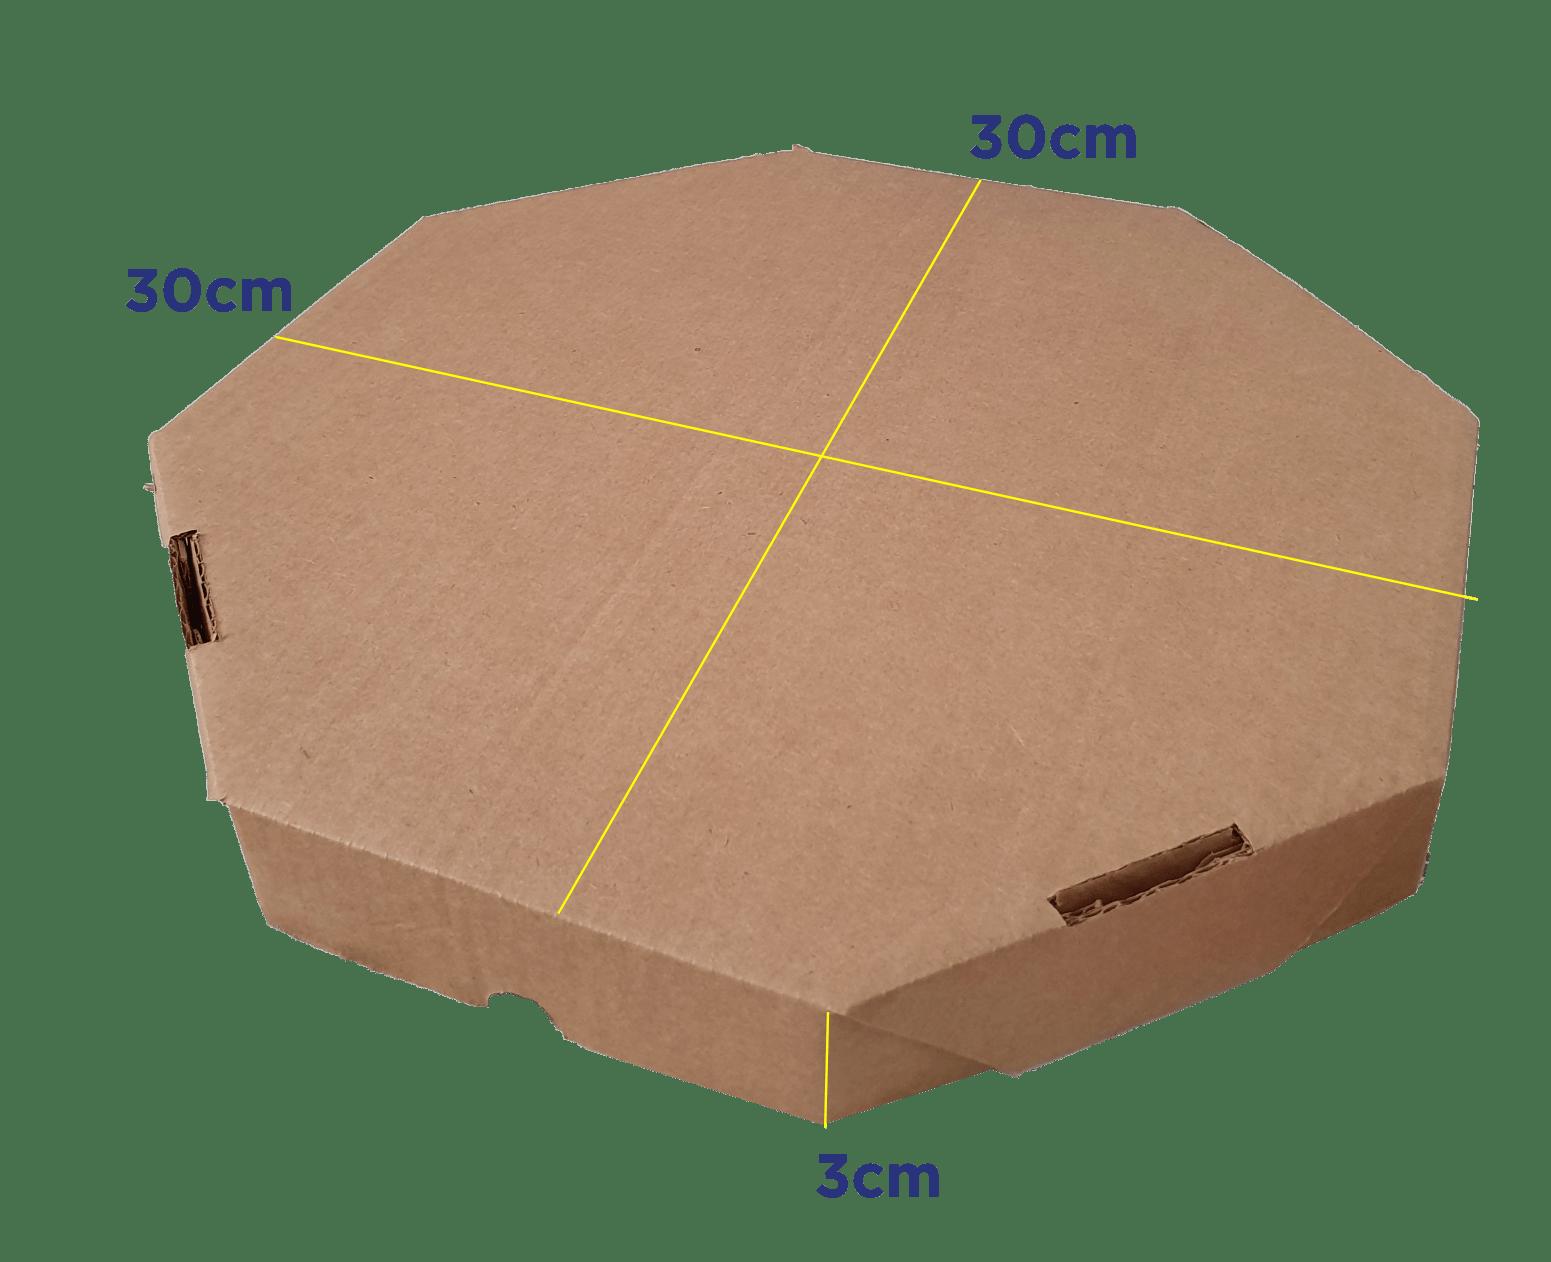 CAIXA DE PIZZA M - PZ30 -30 x 30 x 3cm - PACK C/25 UND